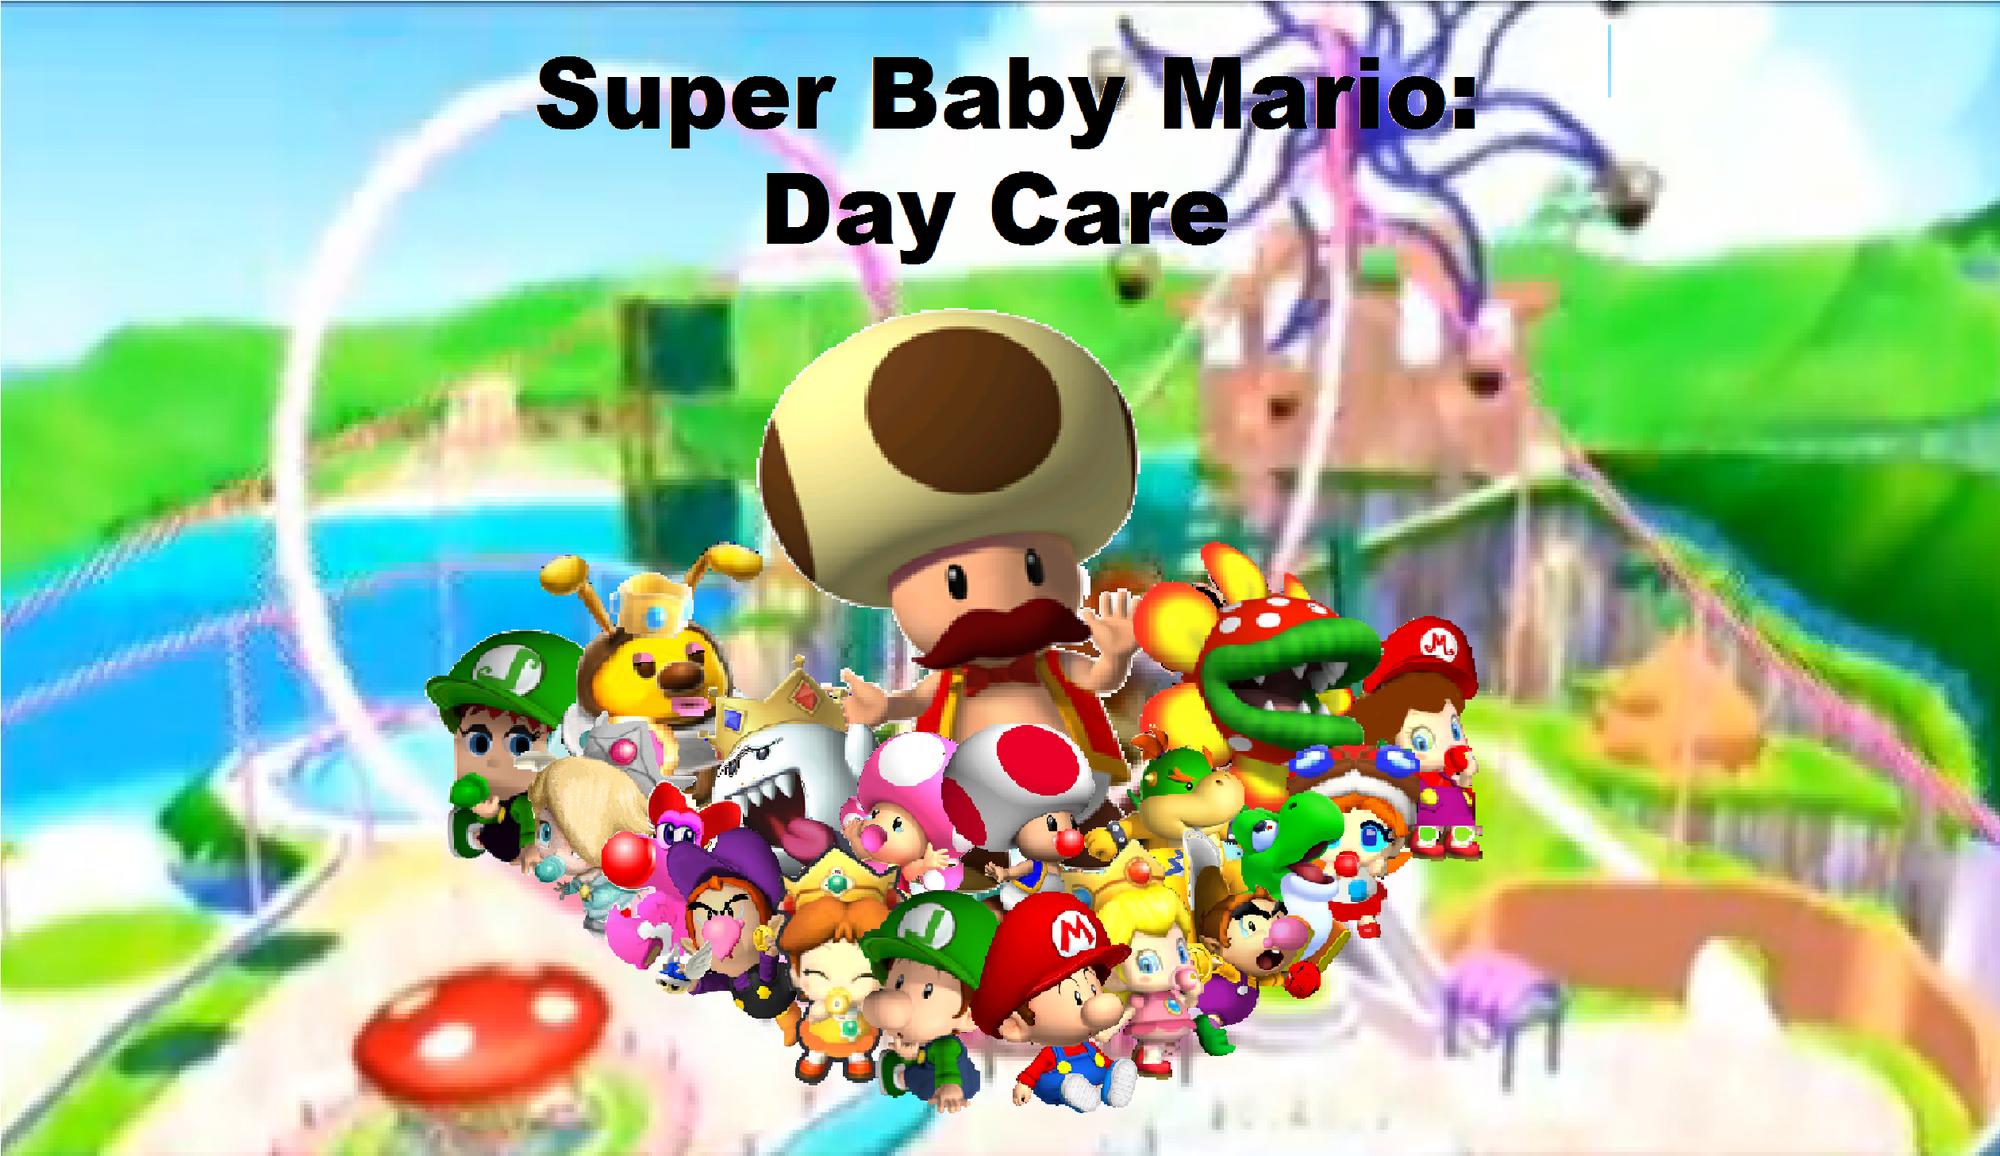 super baby mario day care fantendo nintendo fanon wiki super baby mario day care fantendo nintendo fanon wiki fandom powered by wikia